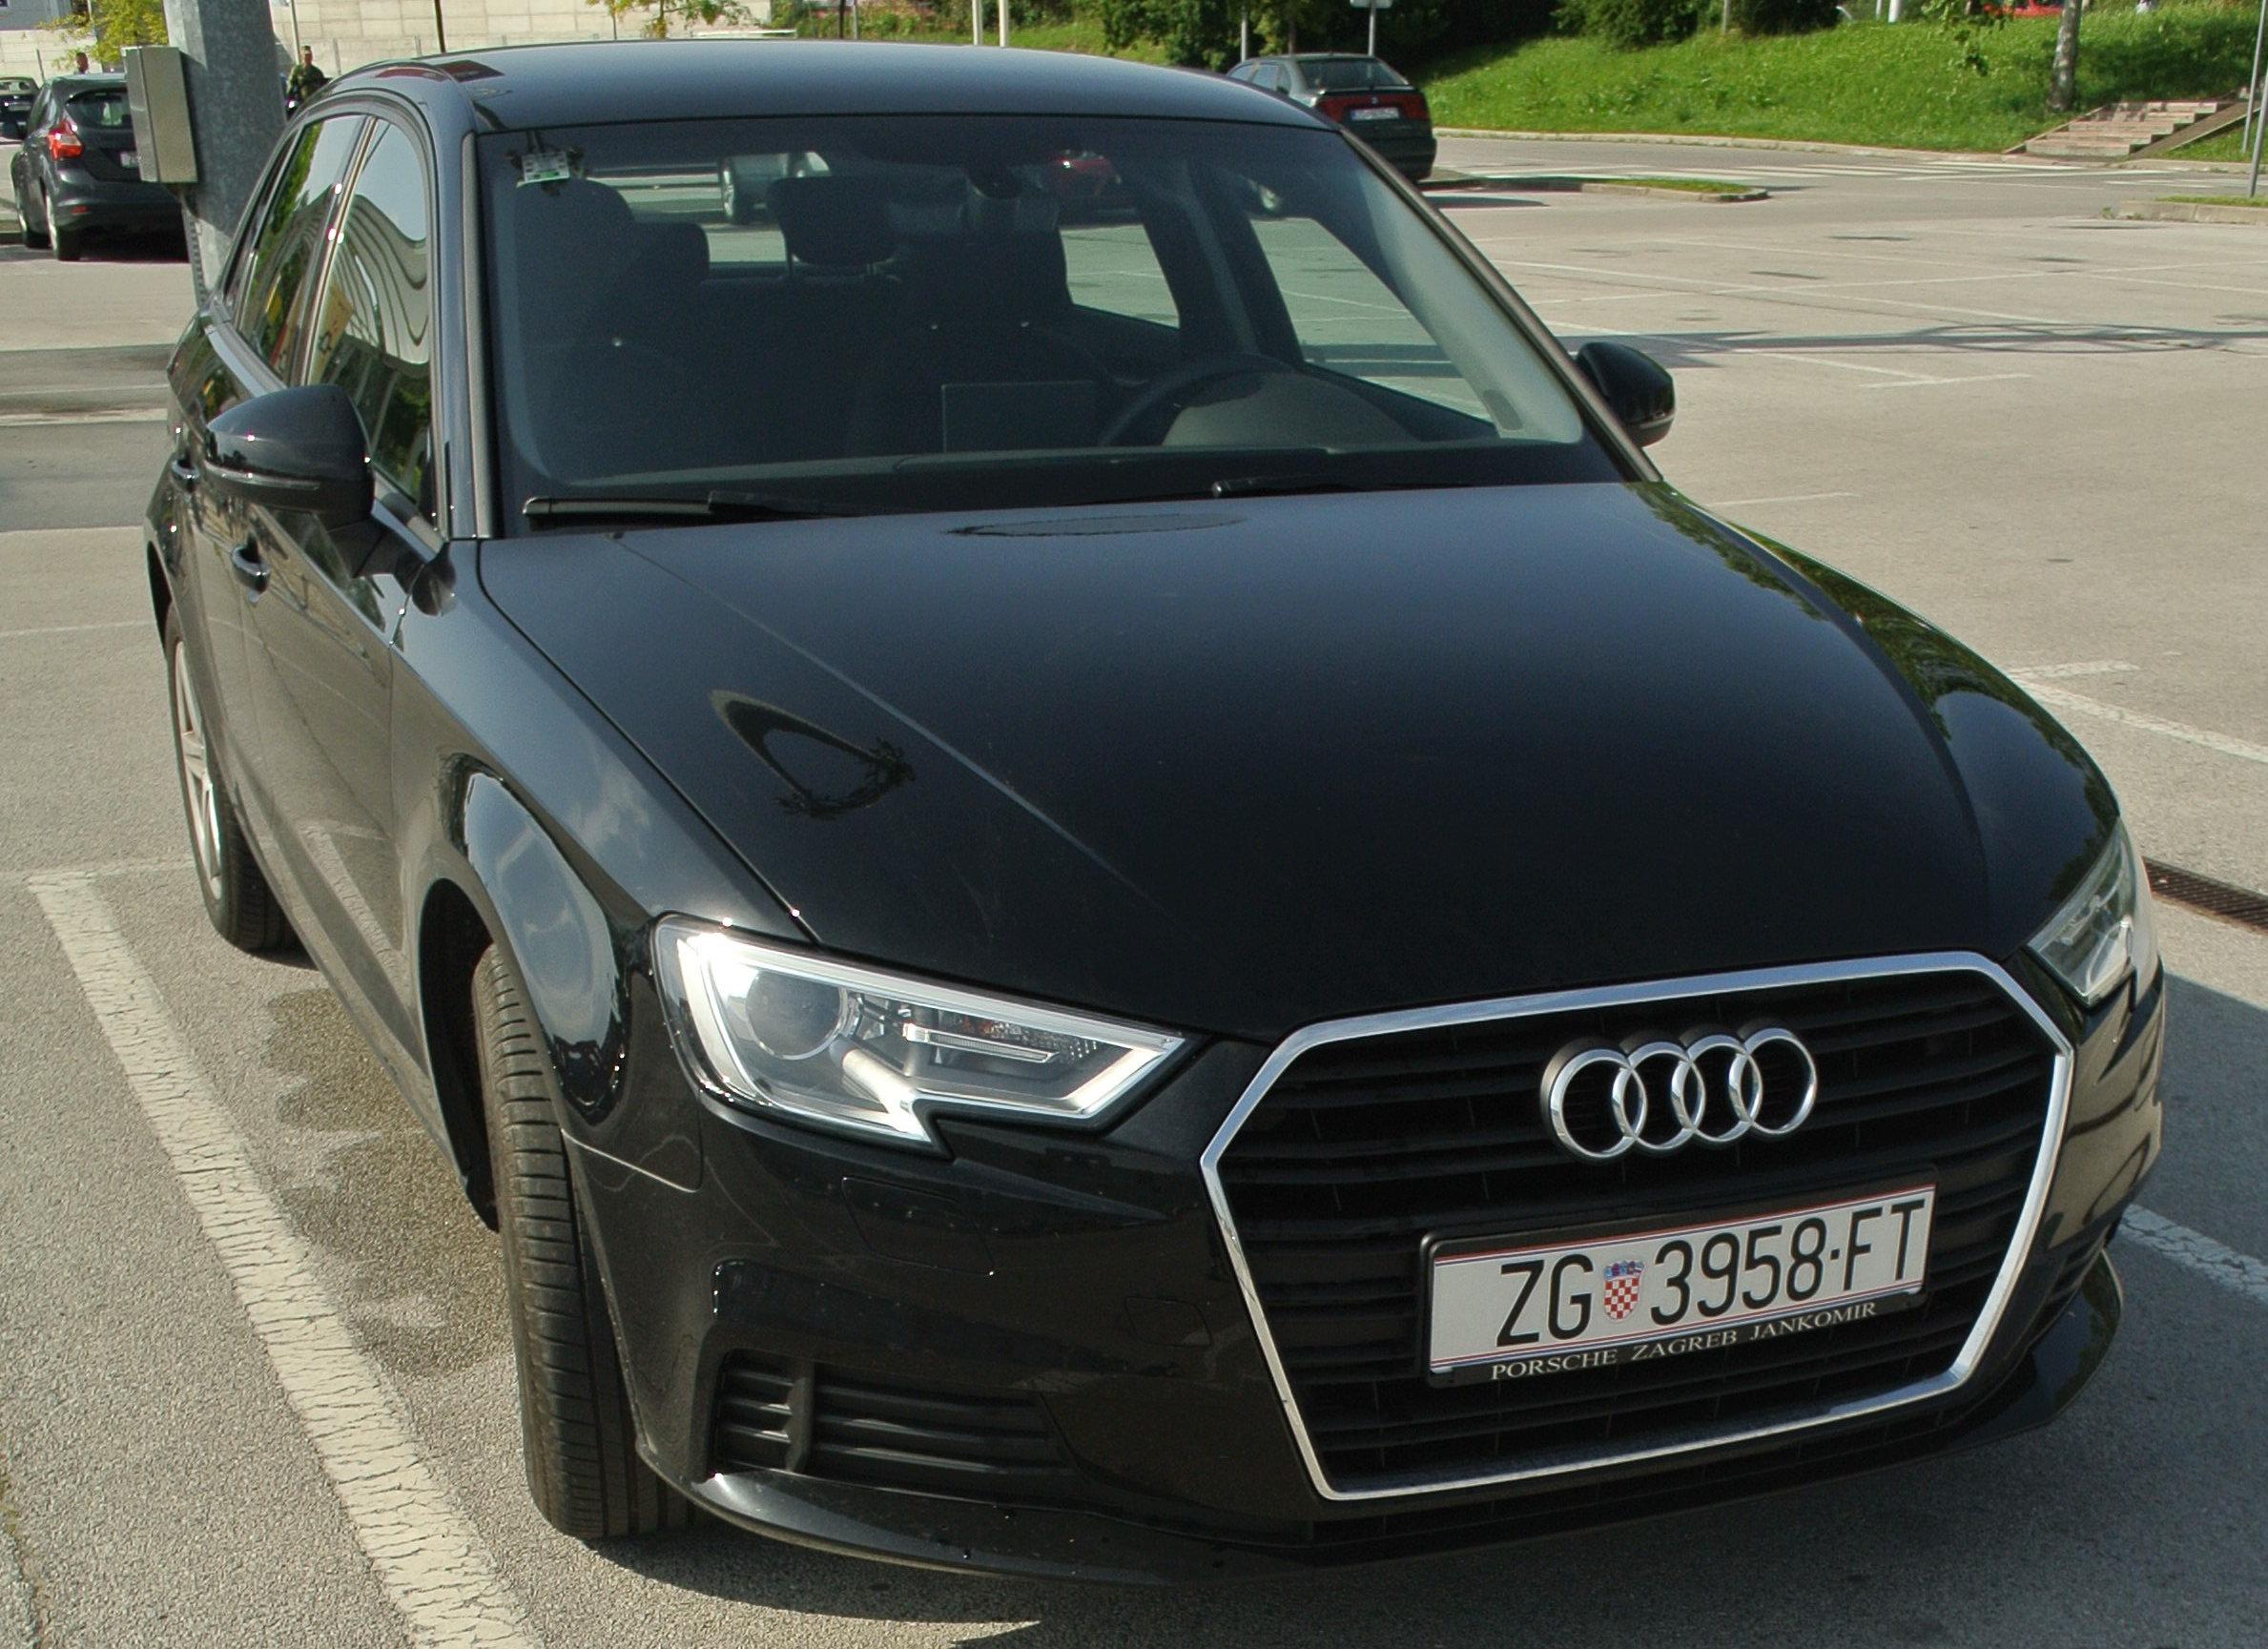 Audi A3 Sportback, 2018, 85 kW